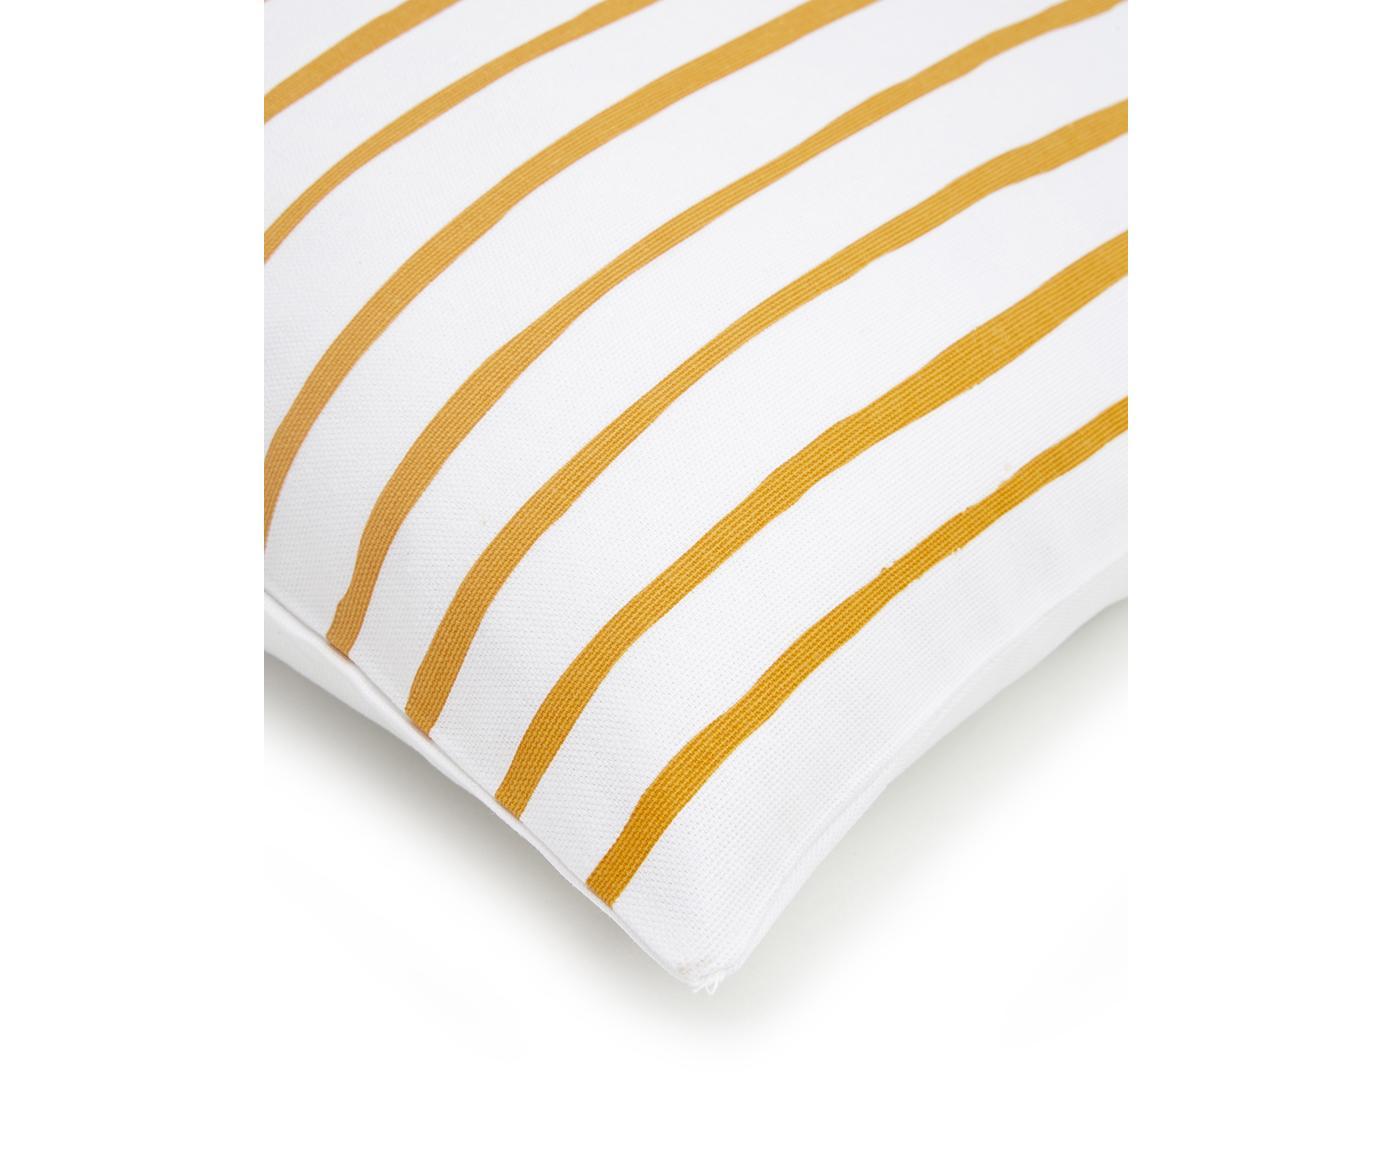 Gestreifte Kissenhülle Ola, 100% Baumwolle, Gelb-Orange, Weiß, 40 x 40 cm